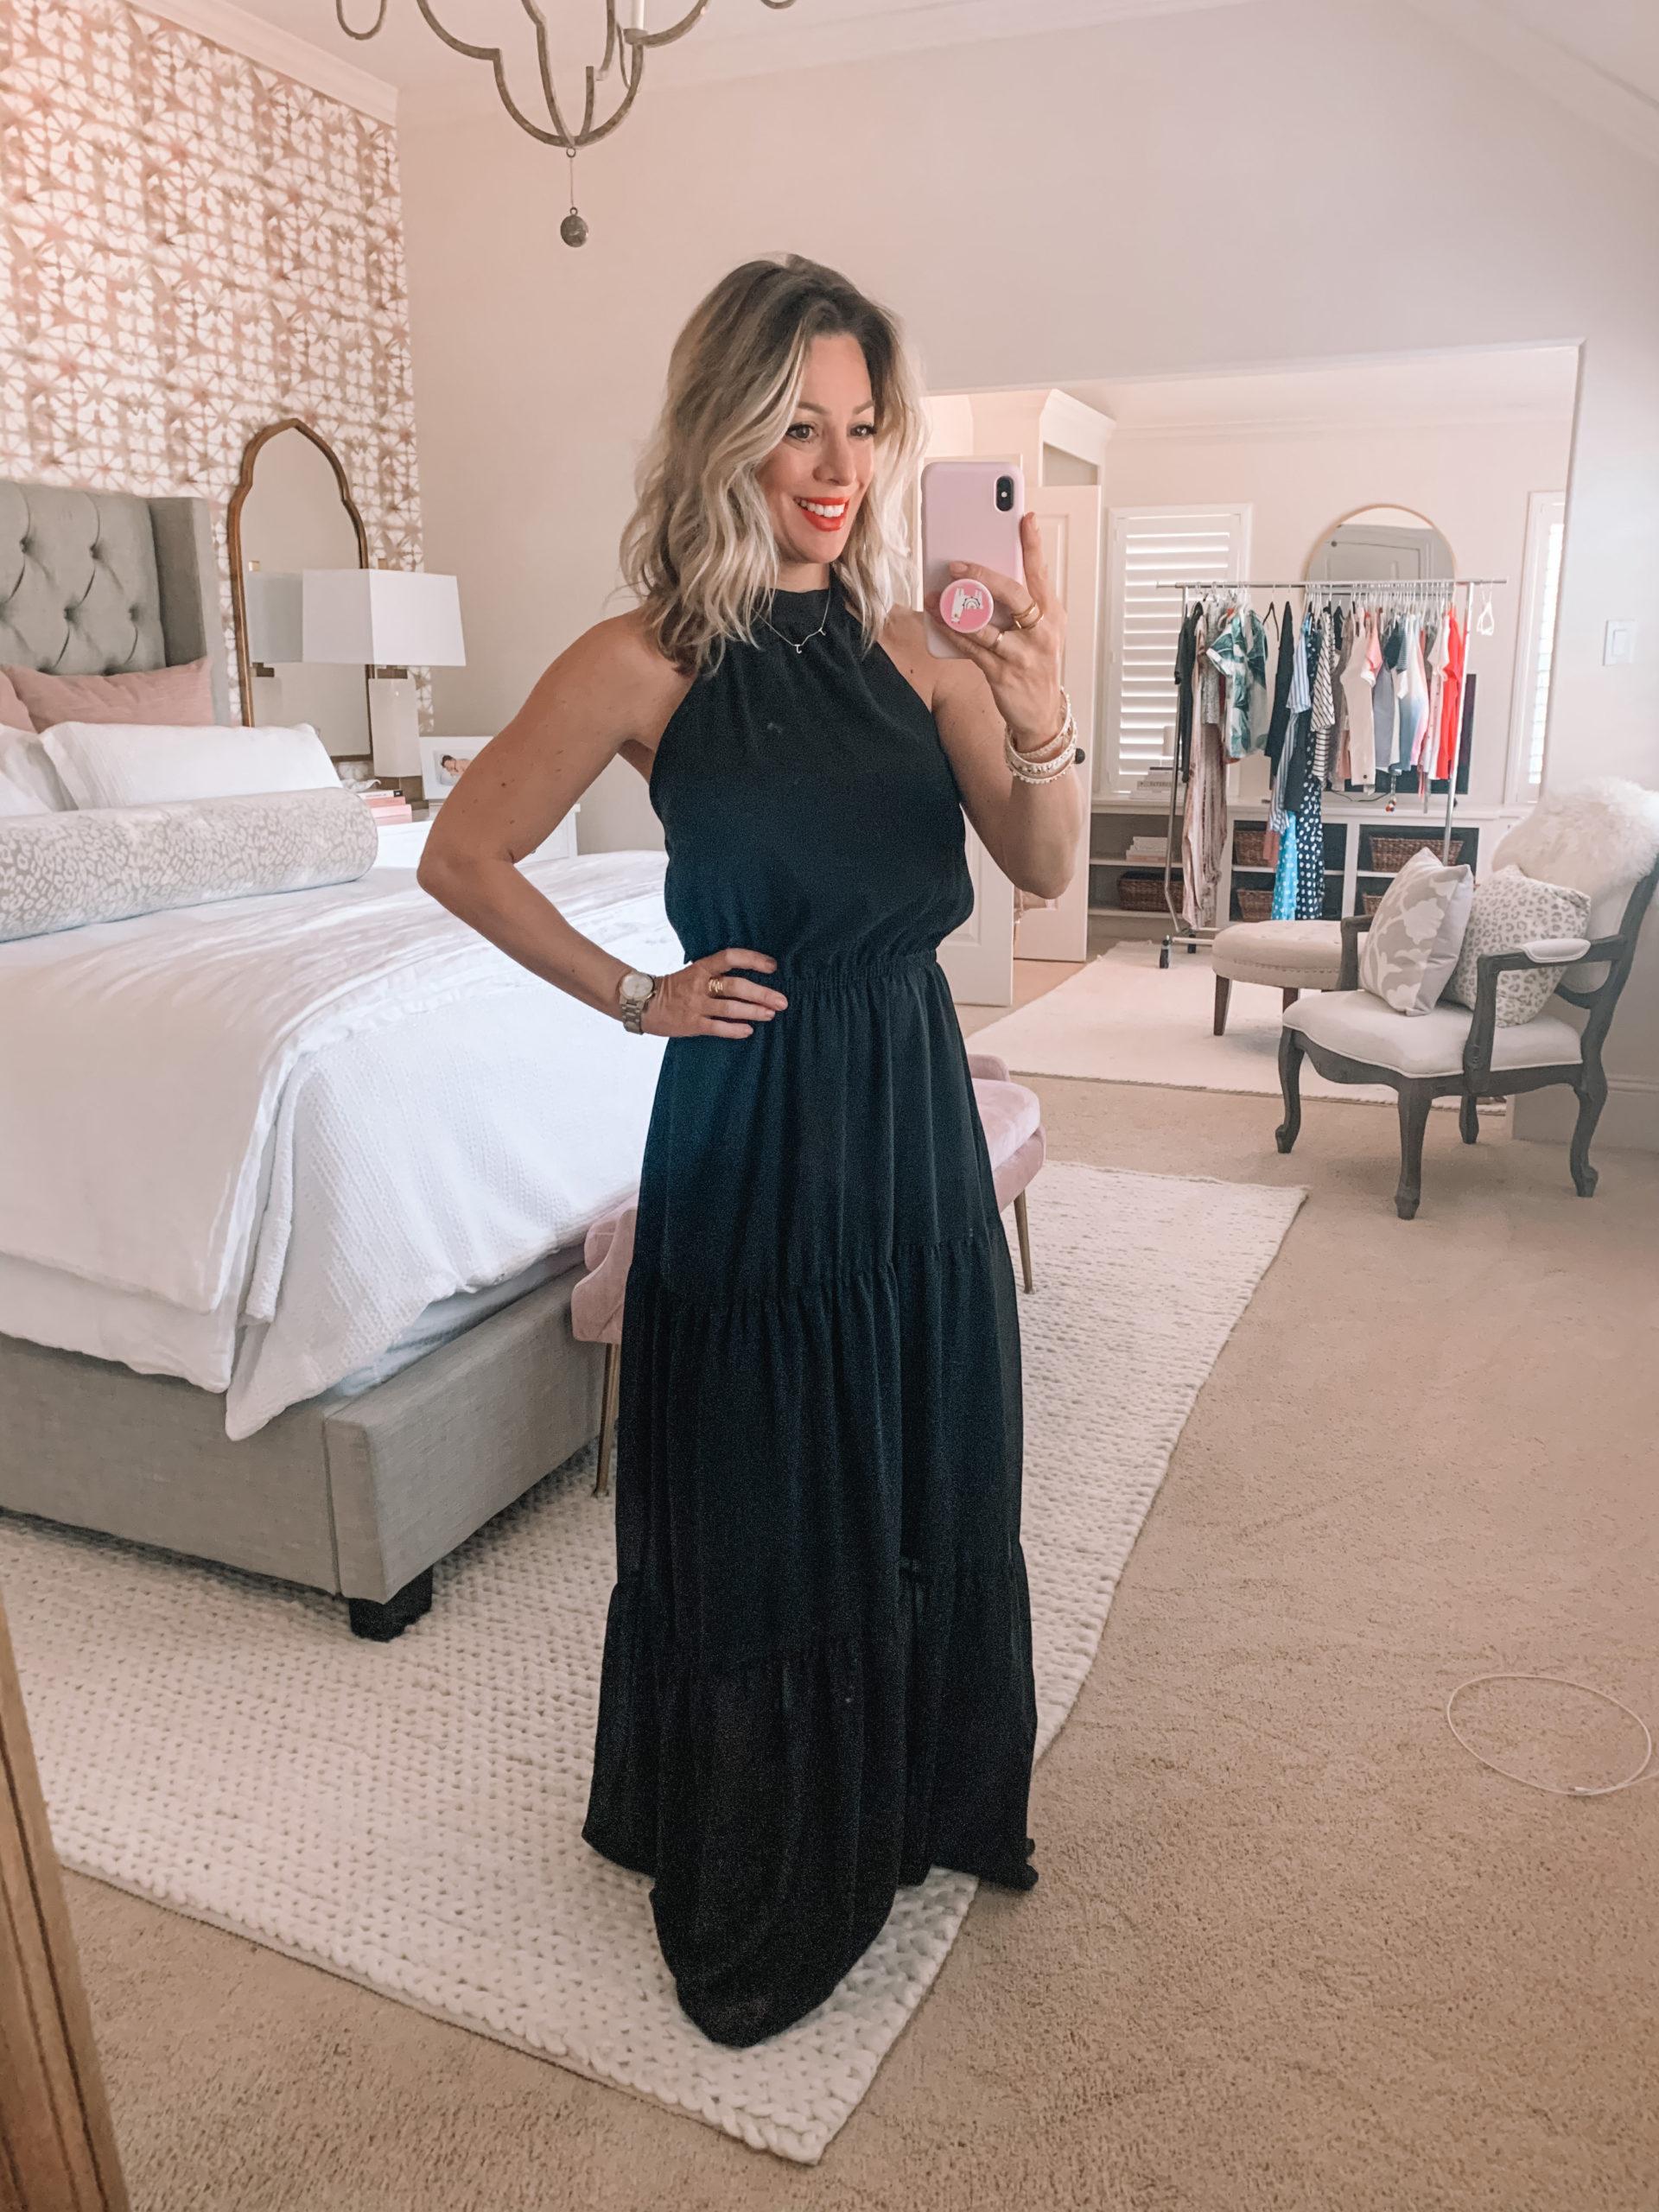 Amazon Fashion - Black Tiered Maxi Dress